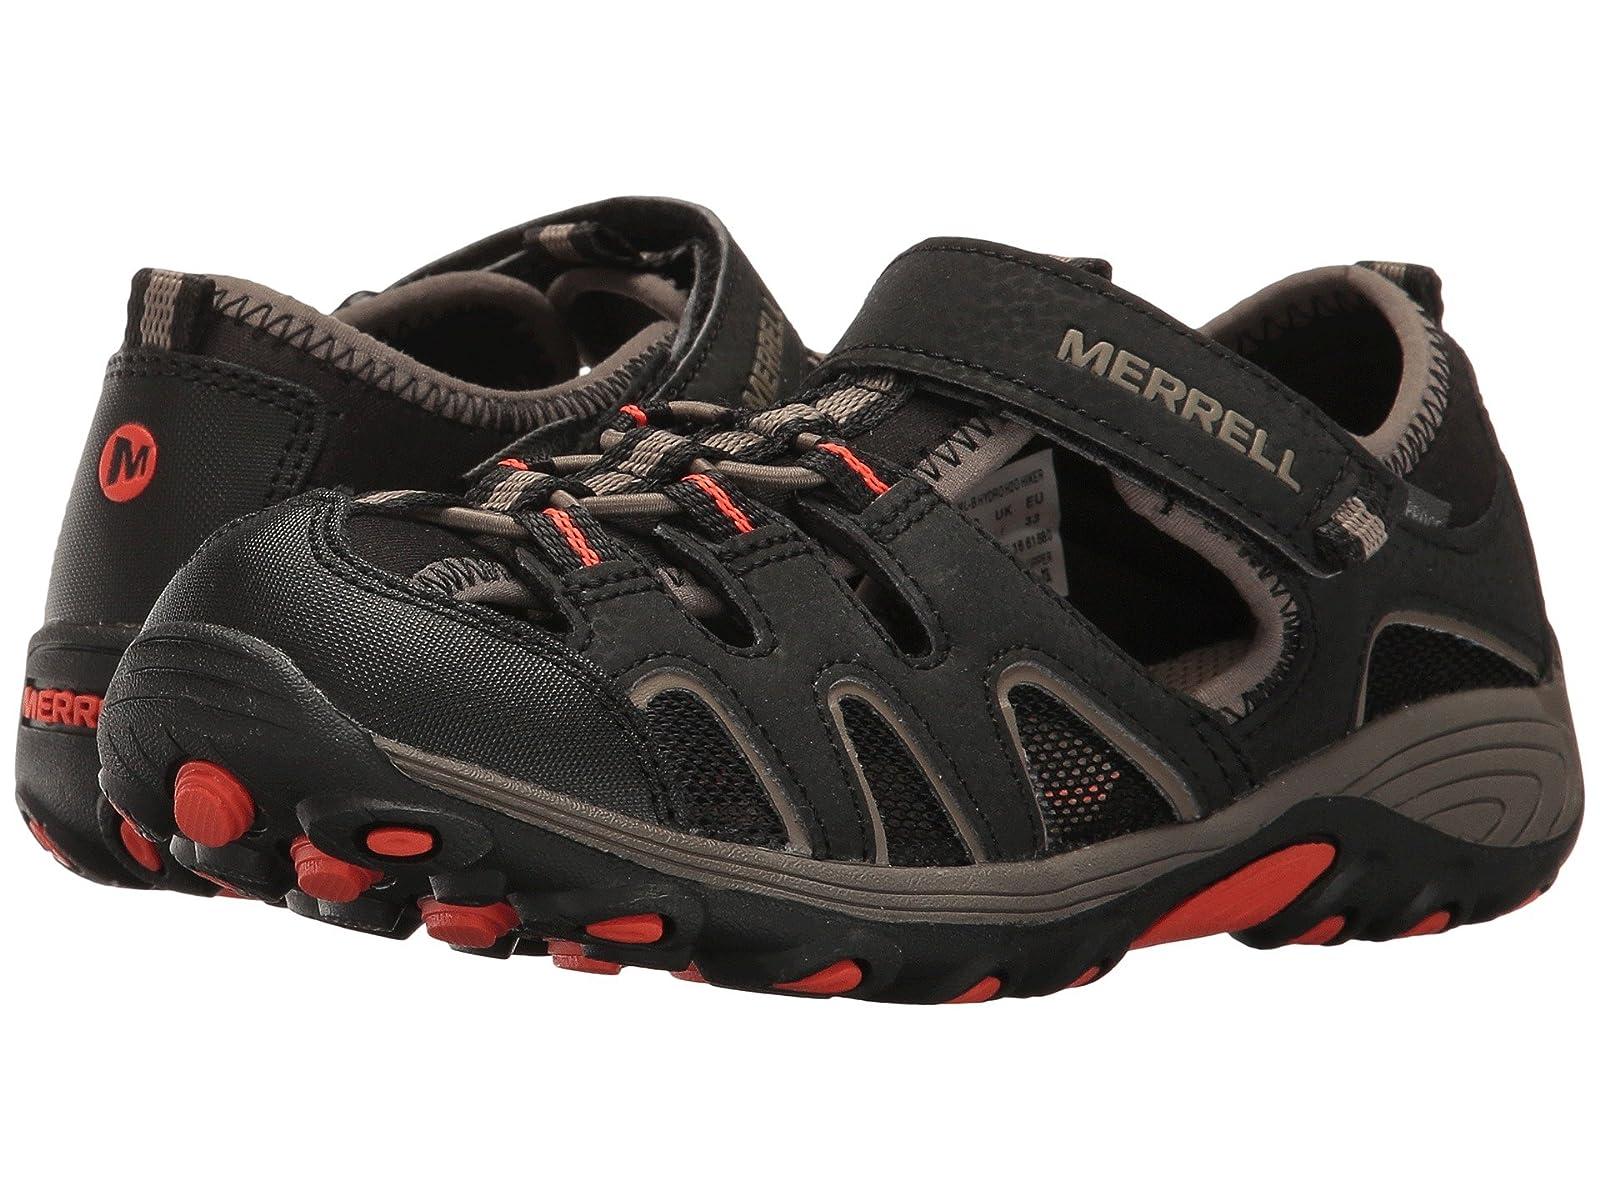 Merrell Kids Hydro H2O Hiker Sandal (Toddler/Little Kid/Big Kid)Cheap and distinctive eye-catching shoes